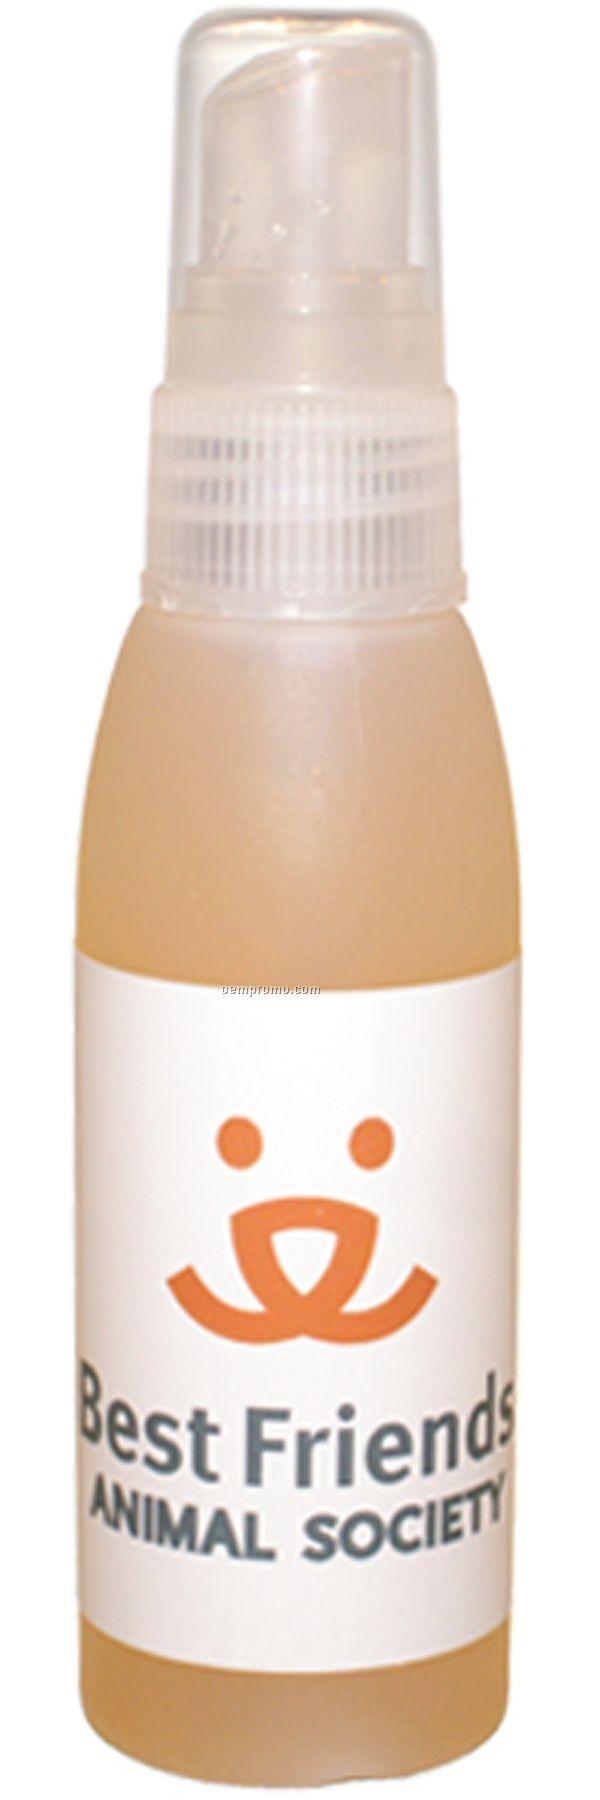 Purepet Waterless Spray Shampoo